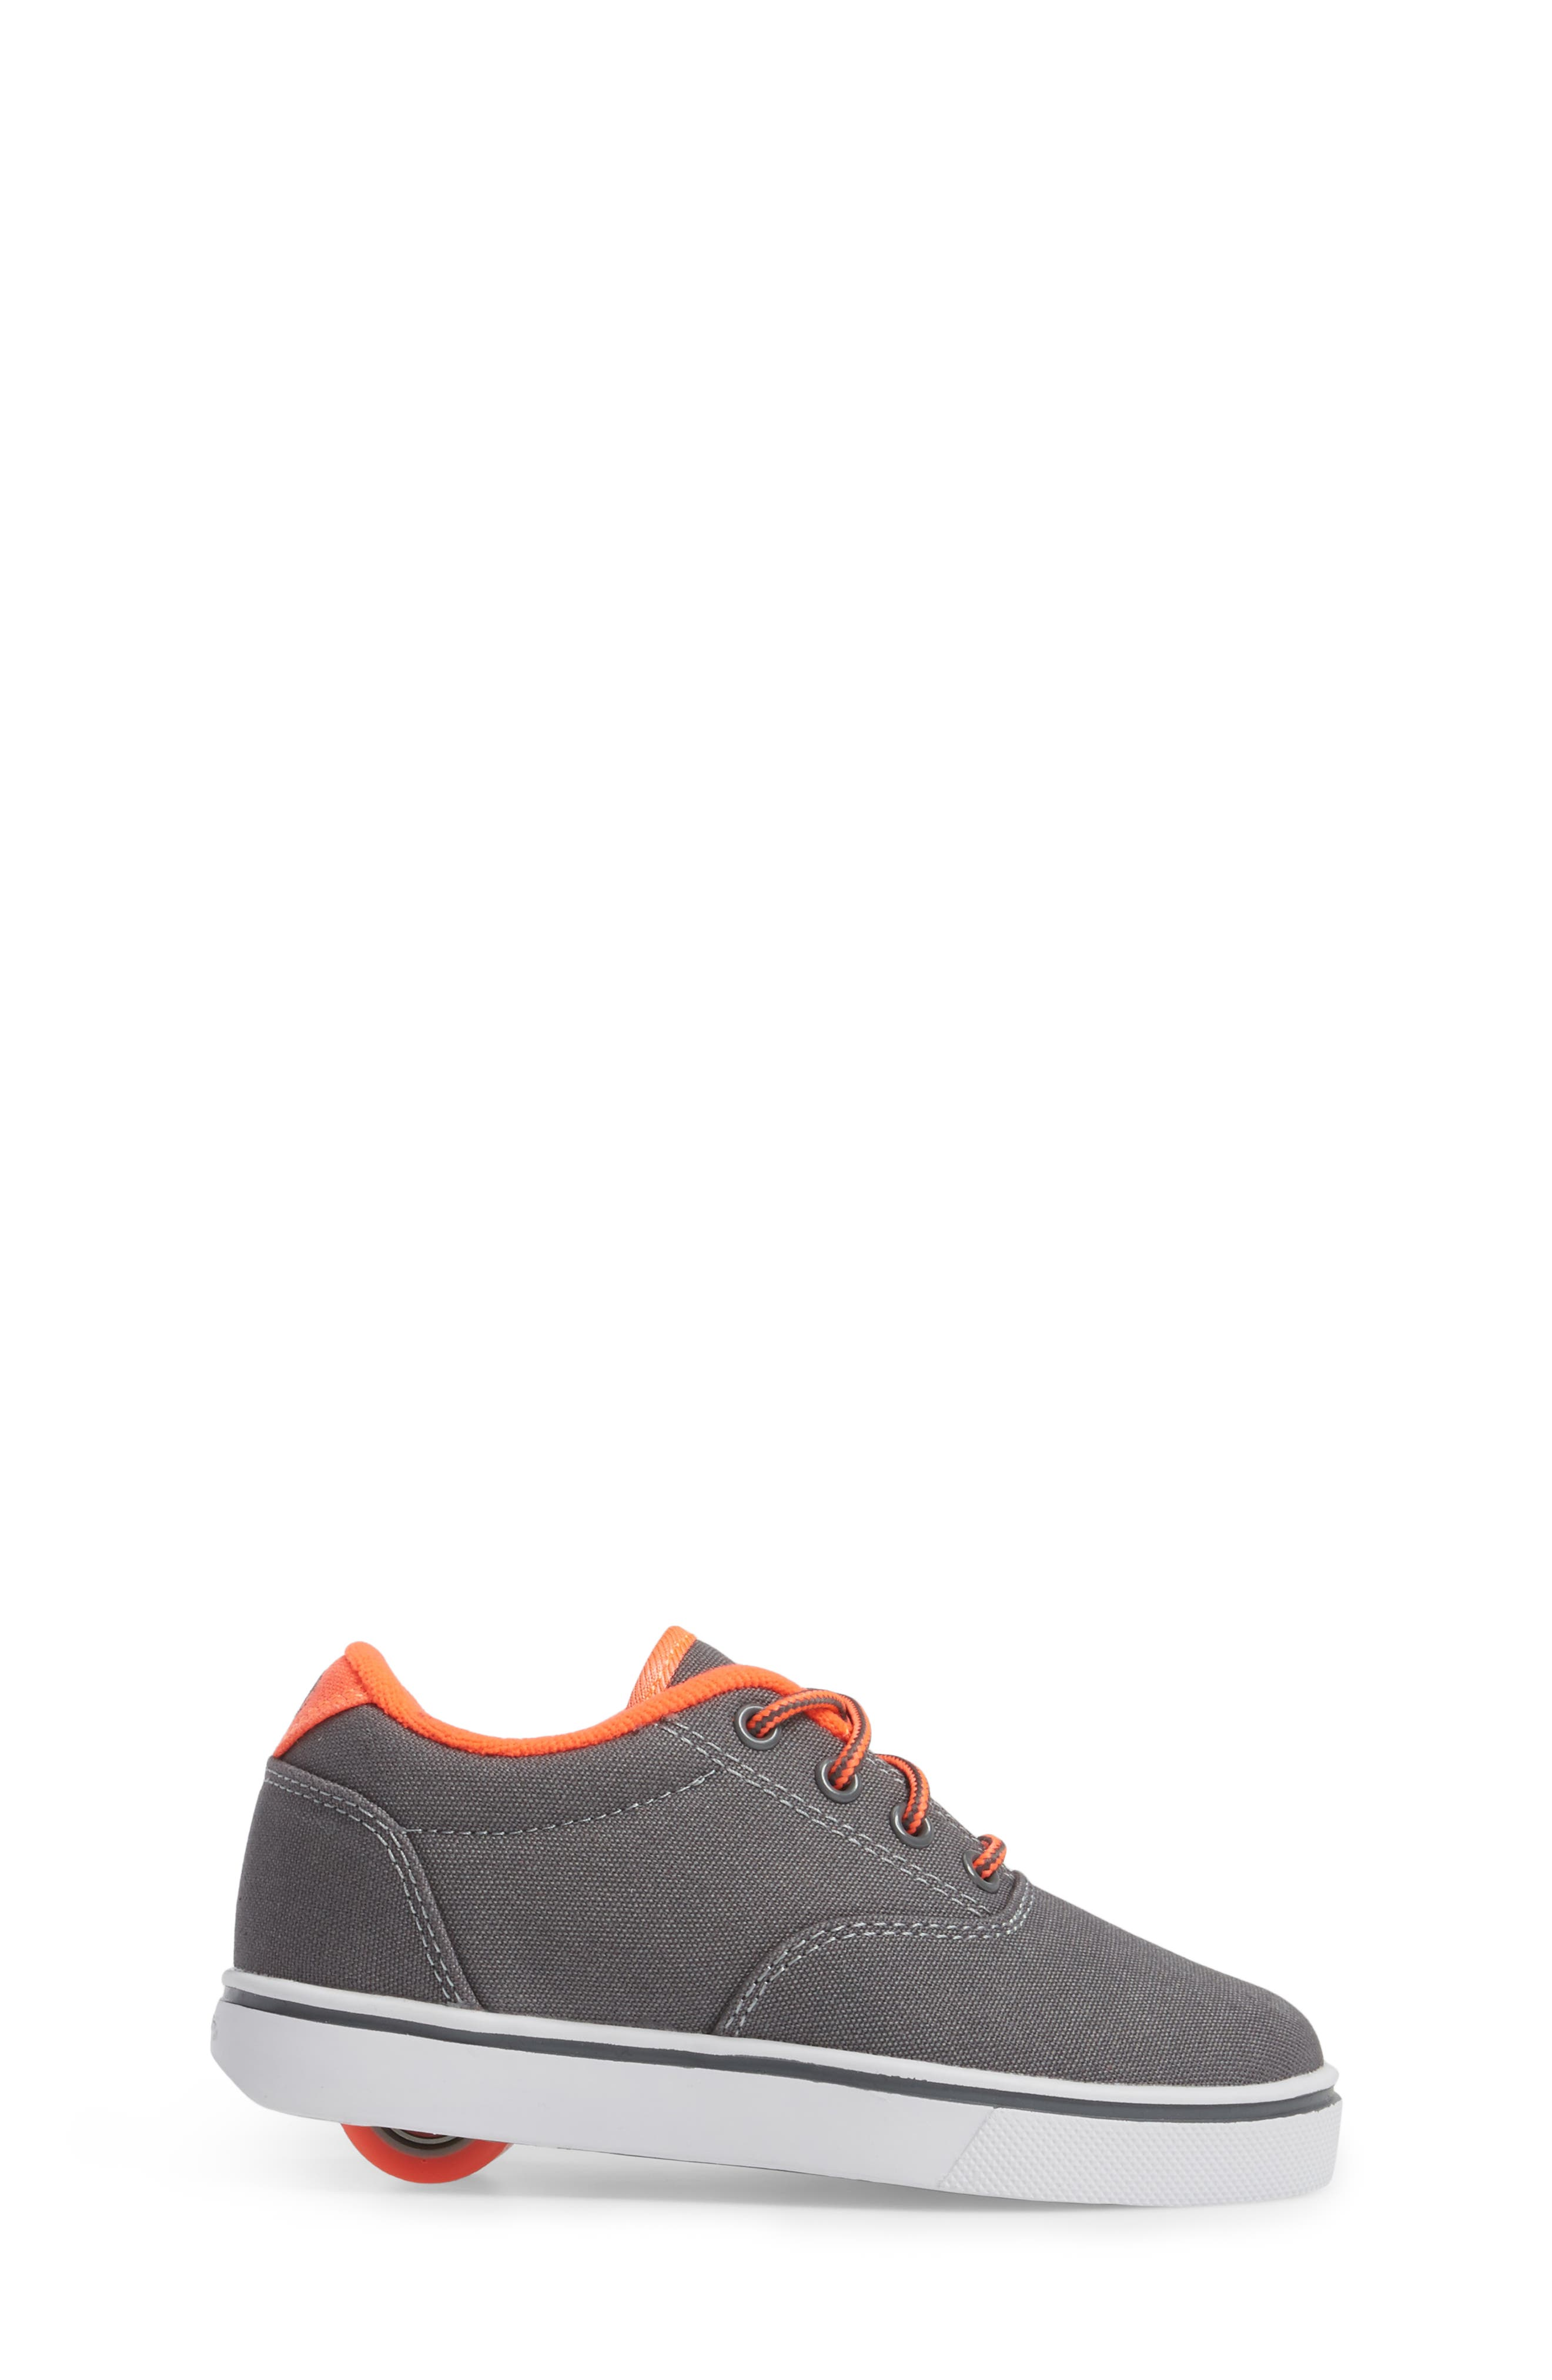 Alternate Image 3  - Heelys 'Launch' Skate Sneaker (Little Kid & Big Kid)